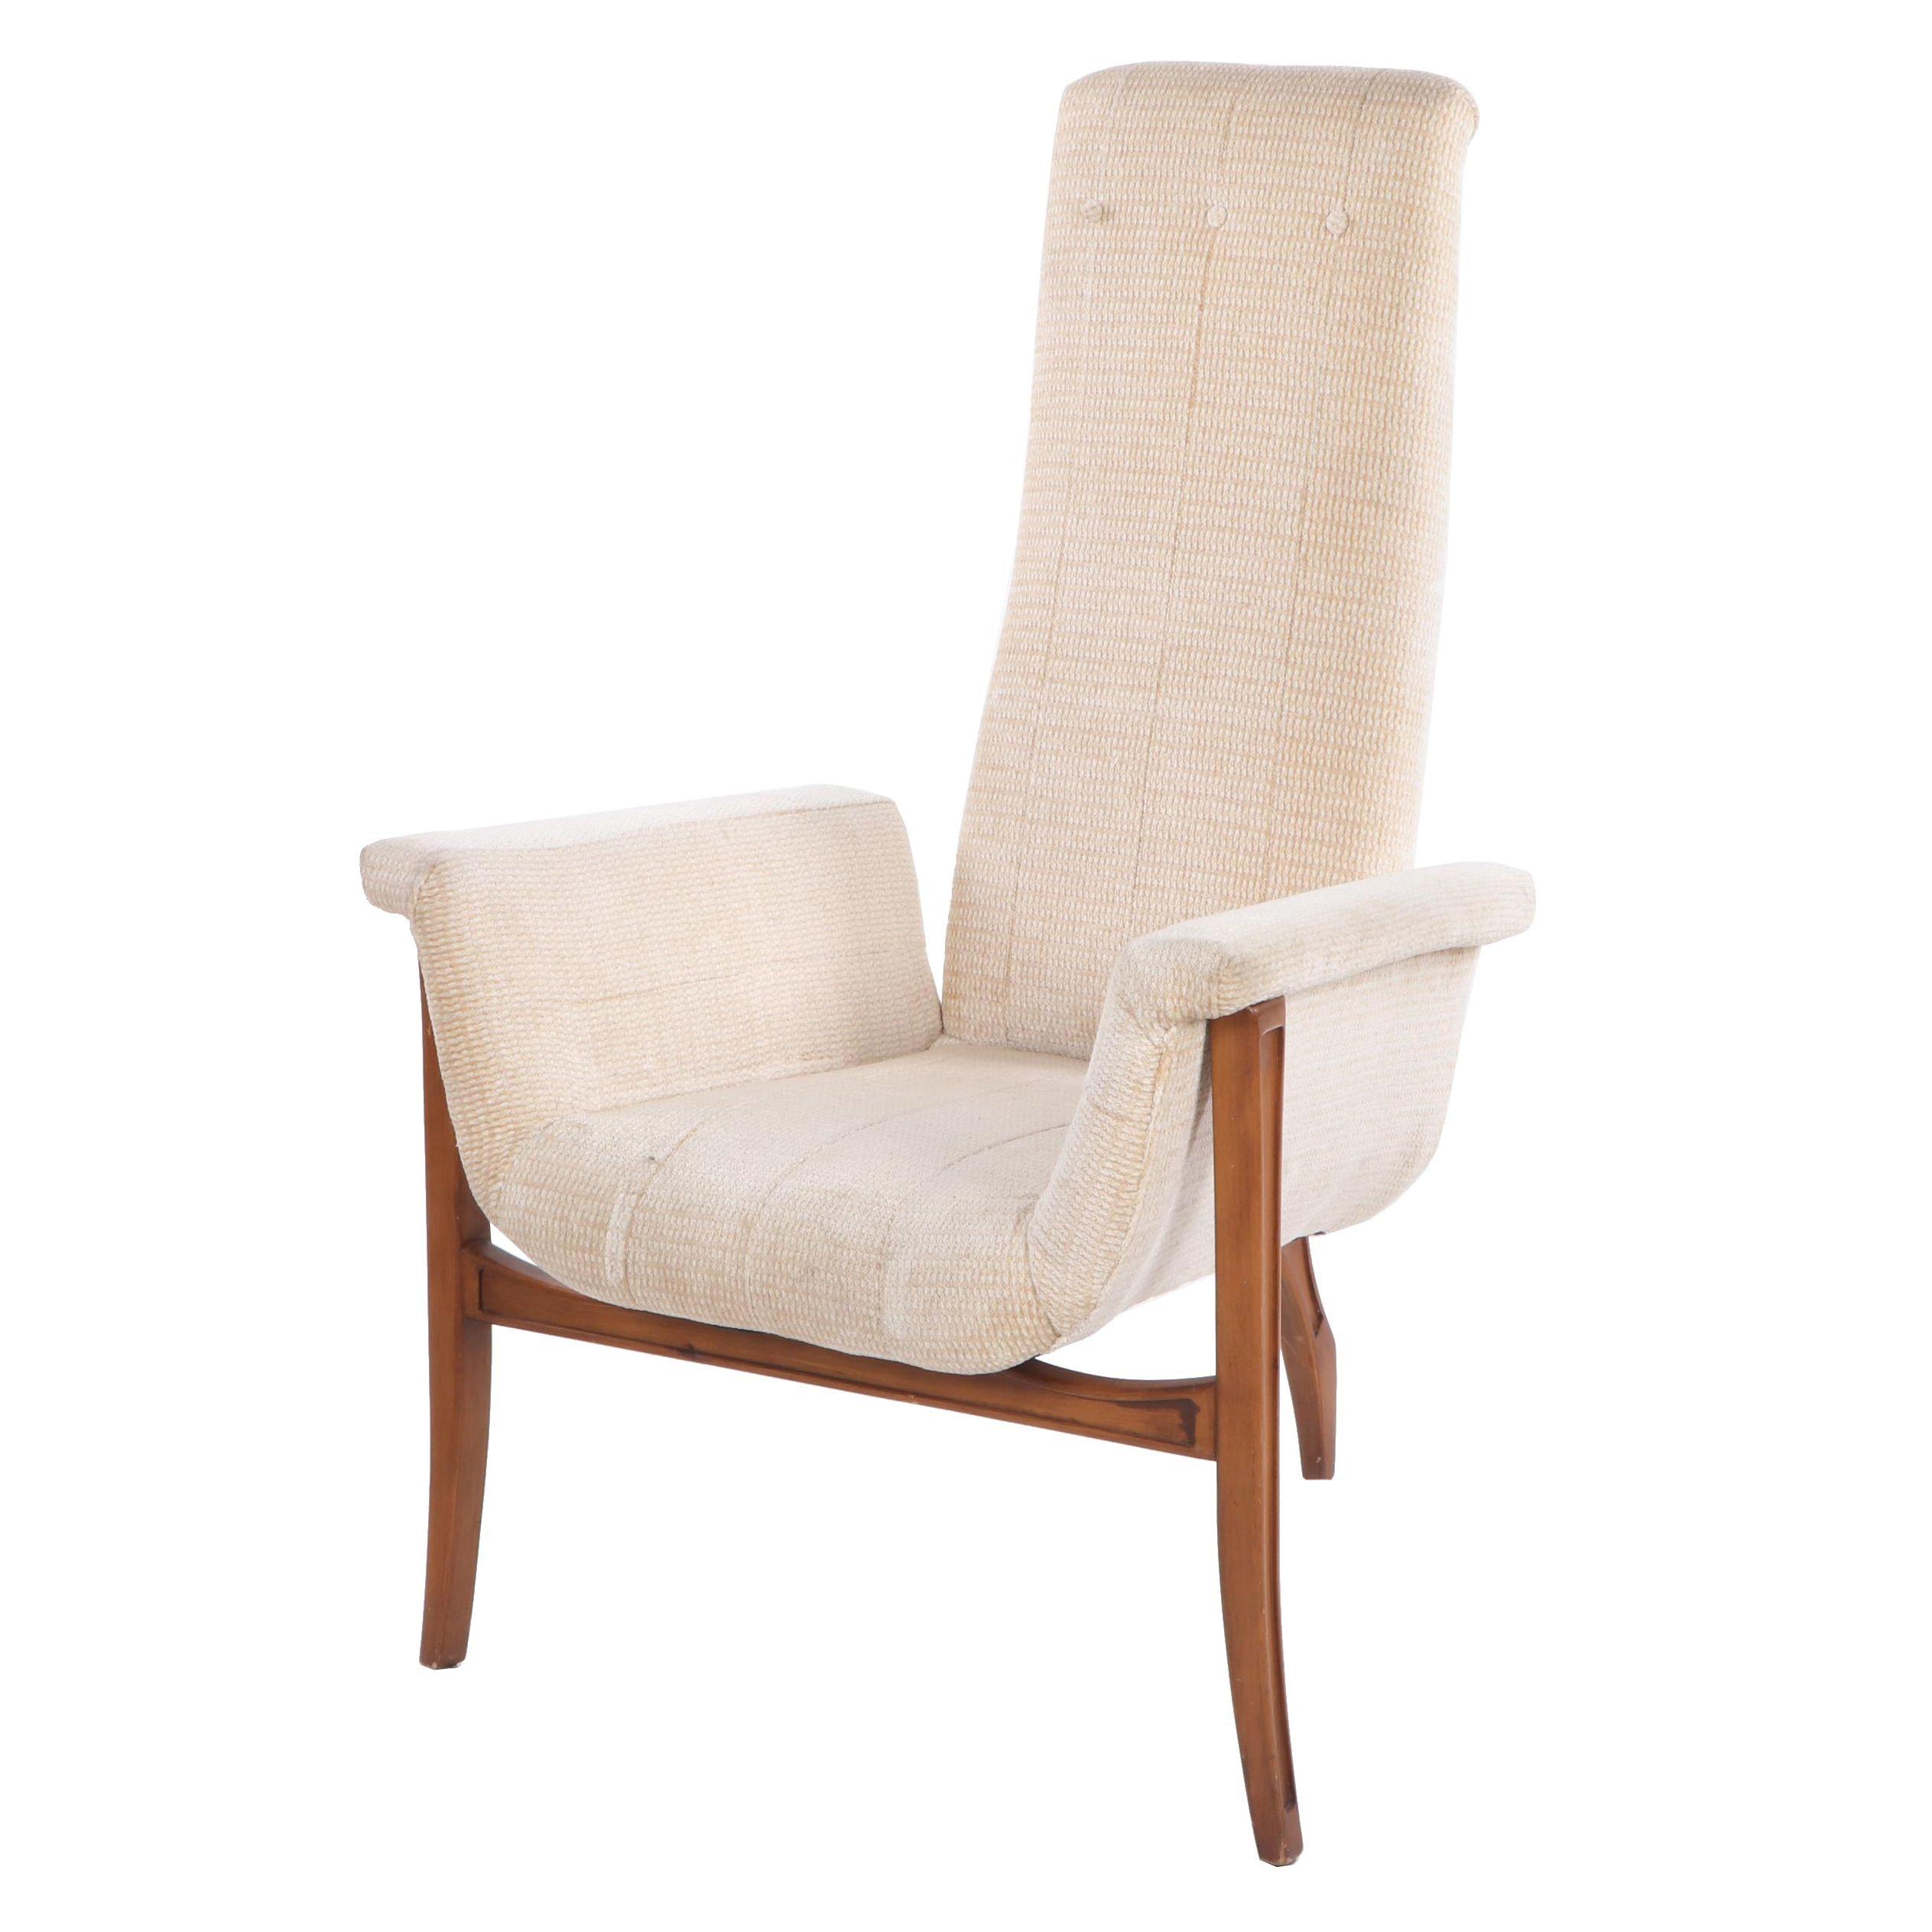 Mid Century Modern Walnut High Back Arm Chair, Mid 20th Century